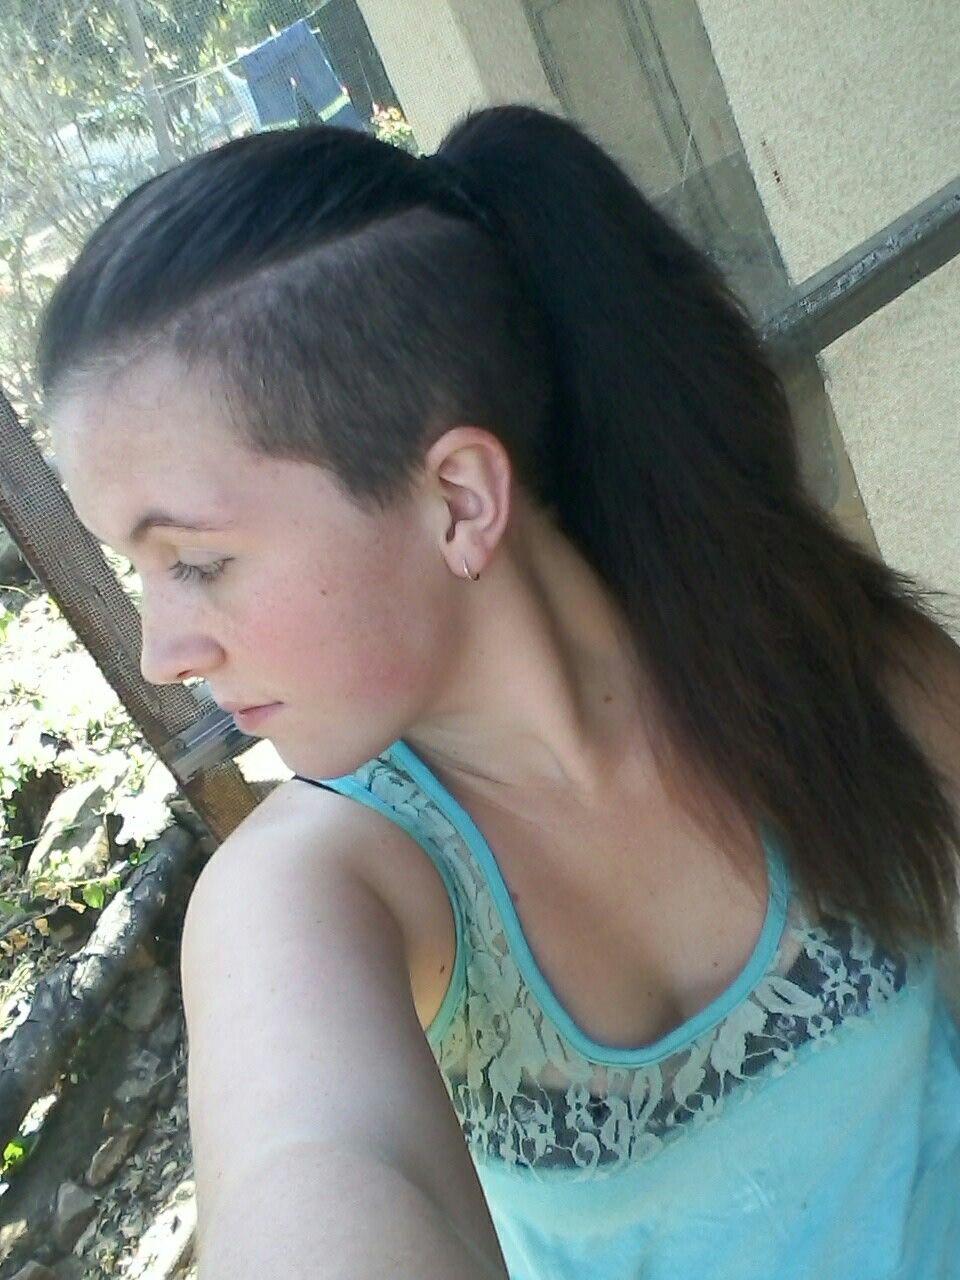 Sidecut Ponytail Sideshave Long Hair Shaved Side My Sidecut Undercut Long Hair Long Hair Shaved Sides Long Hair Styles